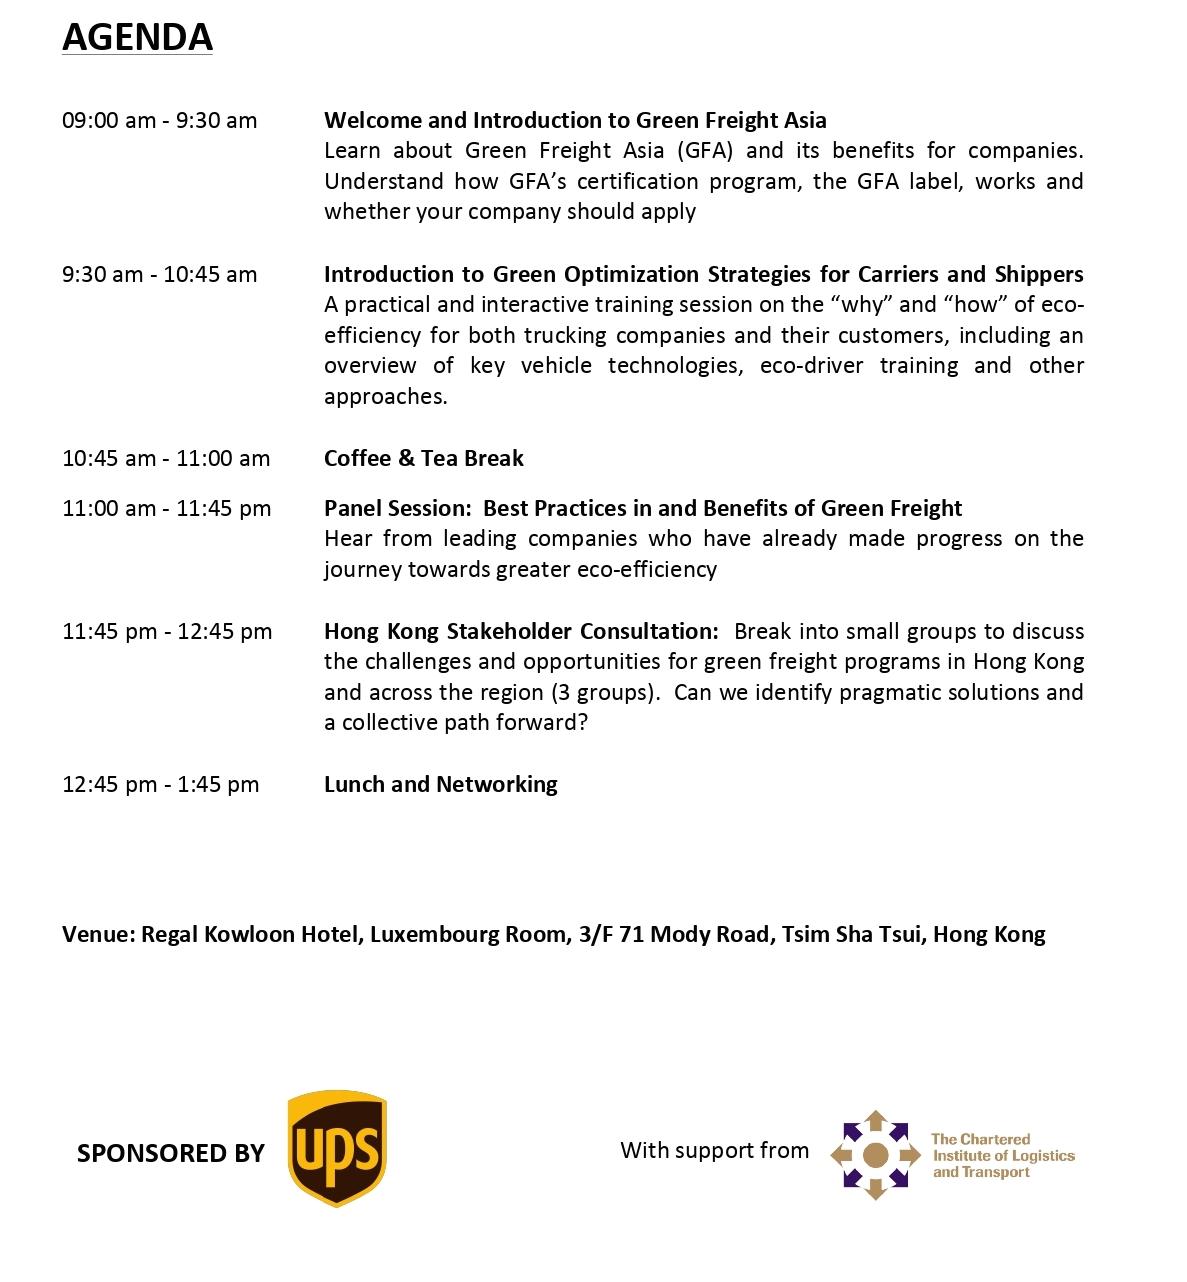 HK GFA Roadshow Agenda 27Jun2019_version3_page-0001.jpg